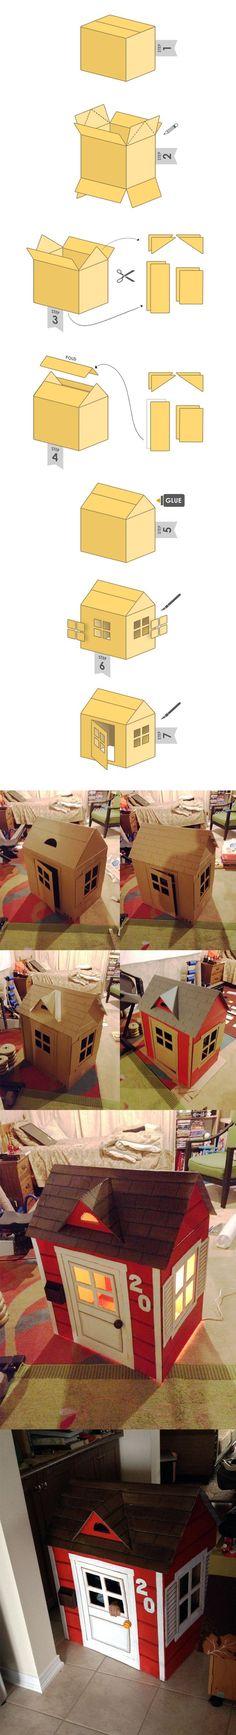 Plan pour construire une maison en carton